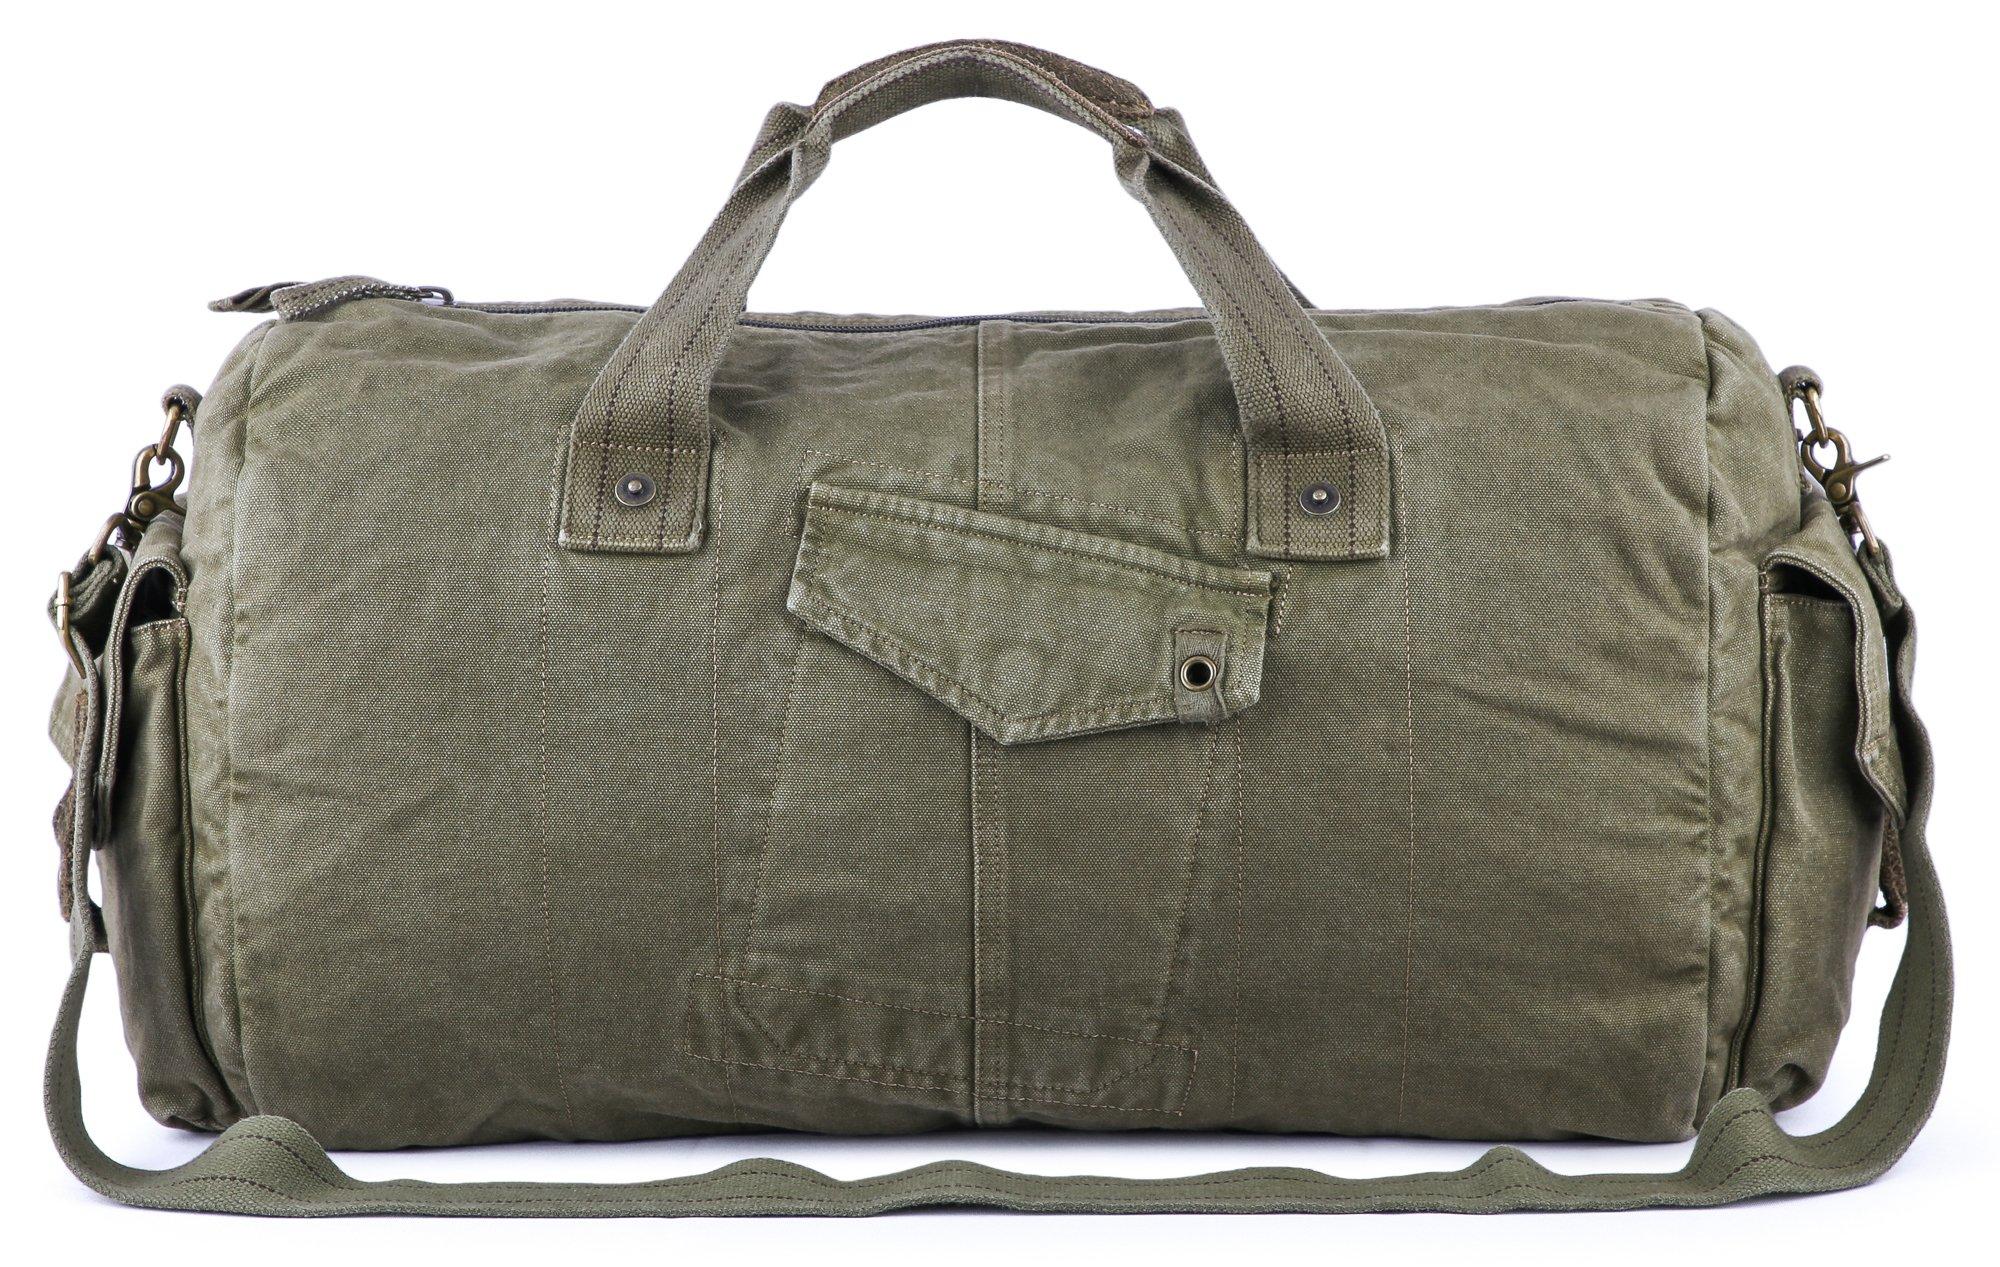 Gootium Canvas Duffel Bag - Vintage Travel Tote Weekend Holdall Sports Gym Bag, Army Green